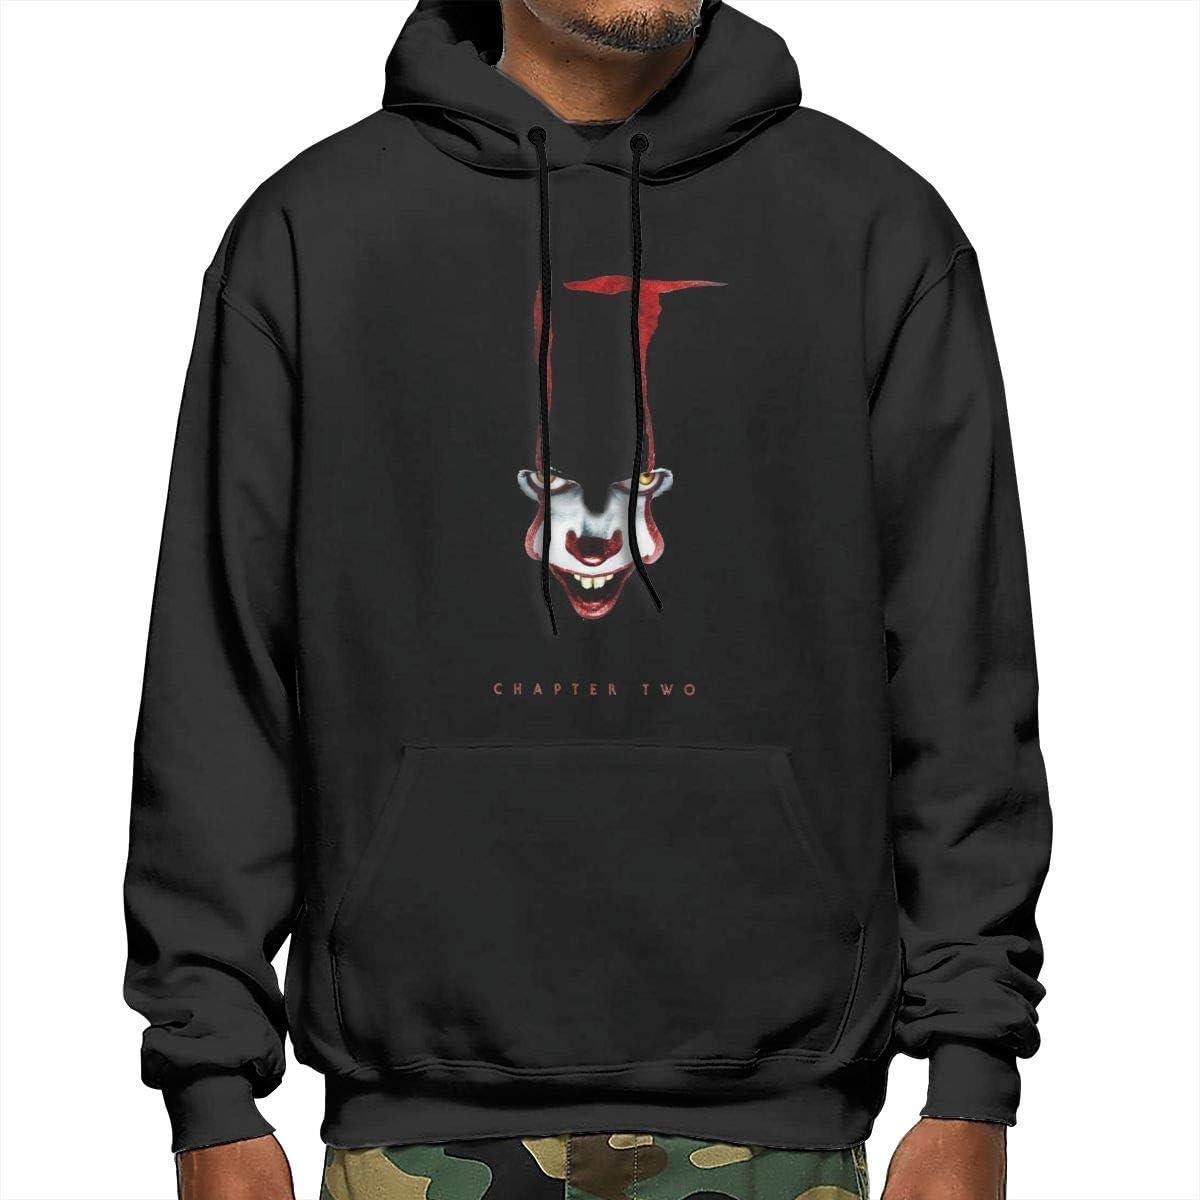 HRSHENG Boys Designed It Chapter 2 Logo Hooded New Sweatshirts Black